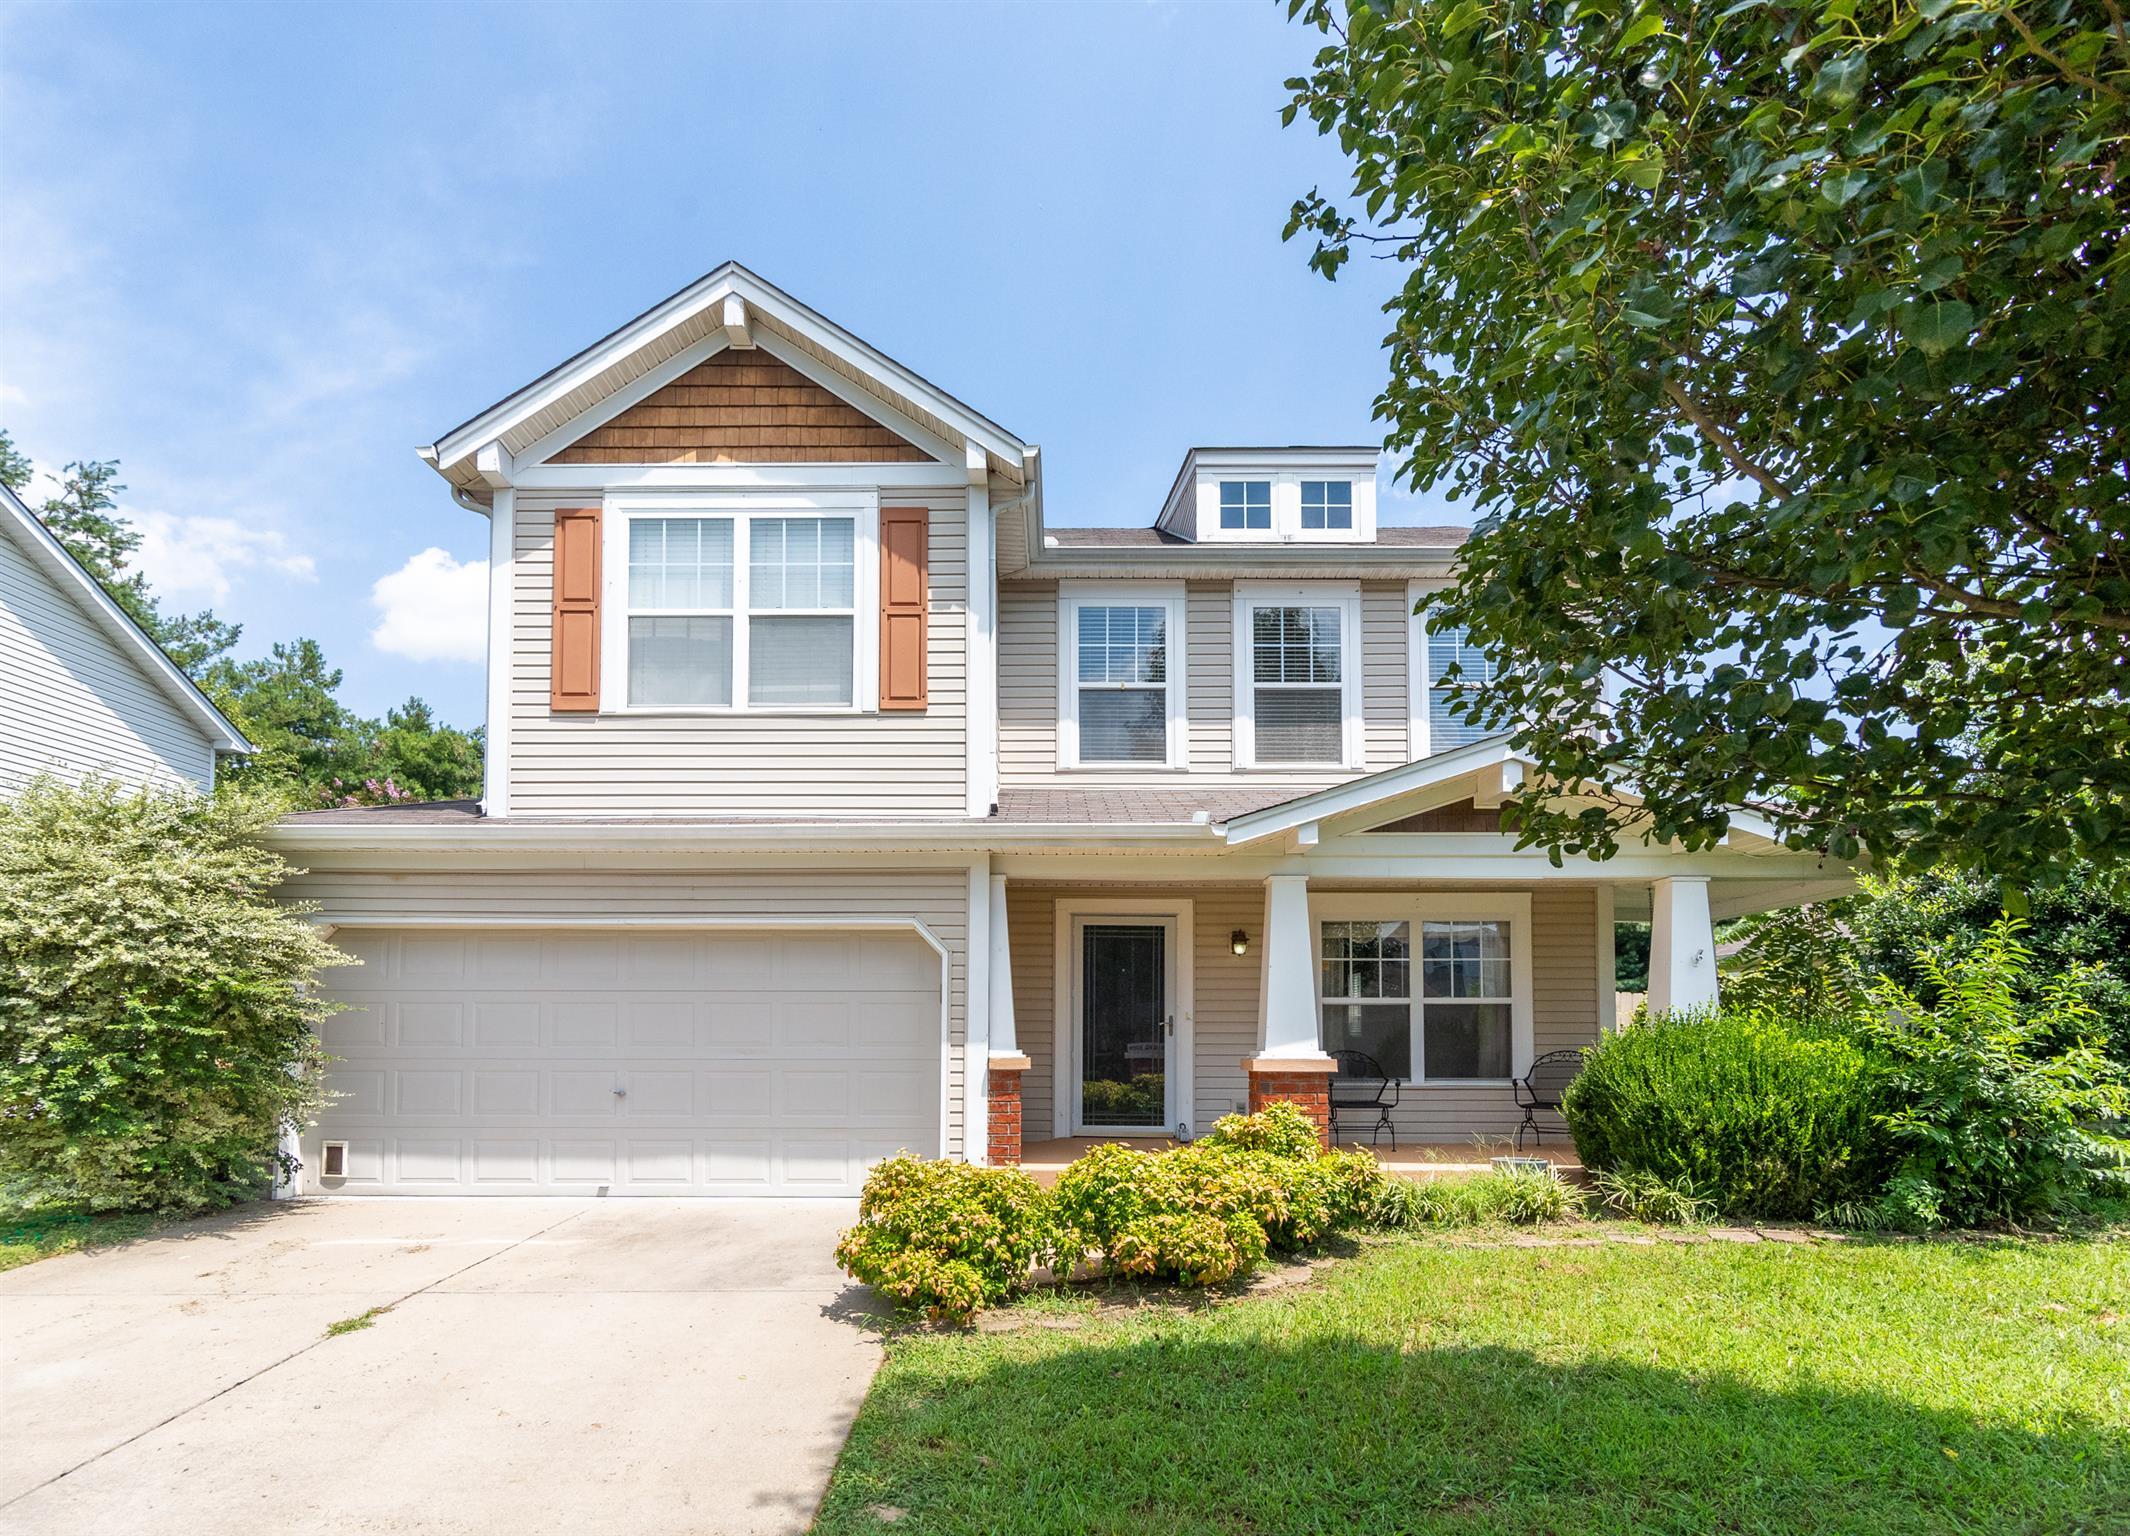 3112 Remington Park Ct, Hermitage, TN 37076 - Hermitage, TN real estate listing